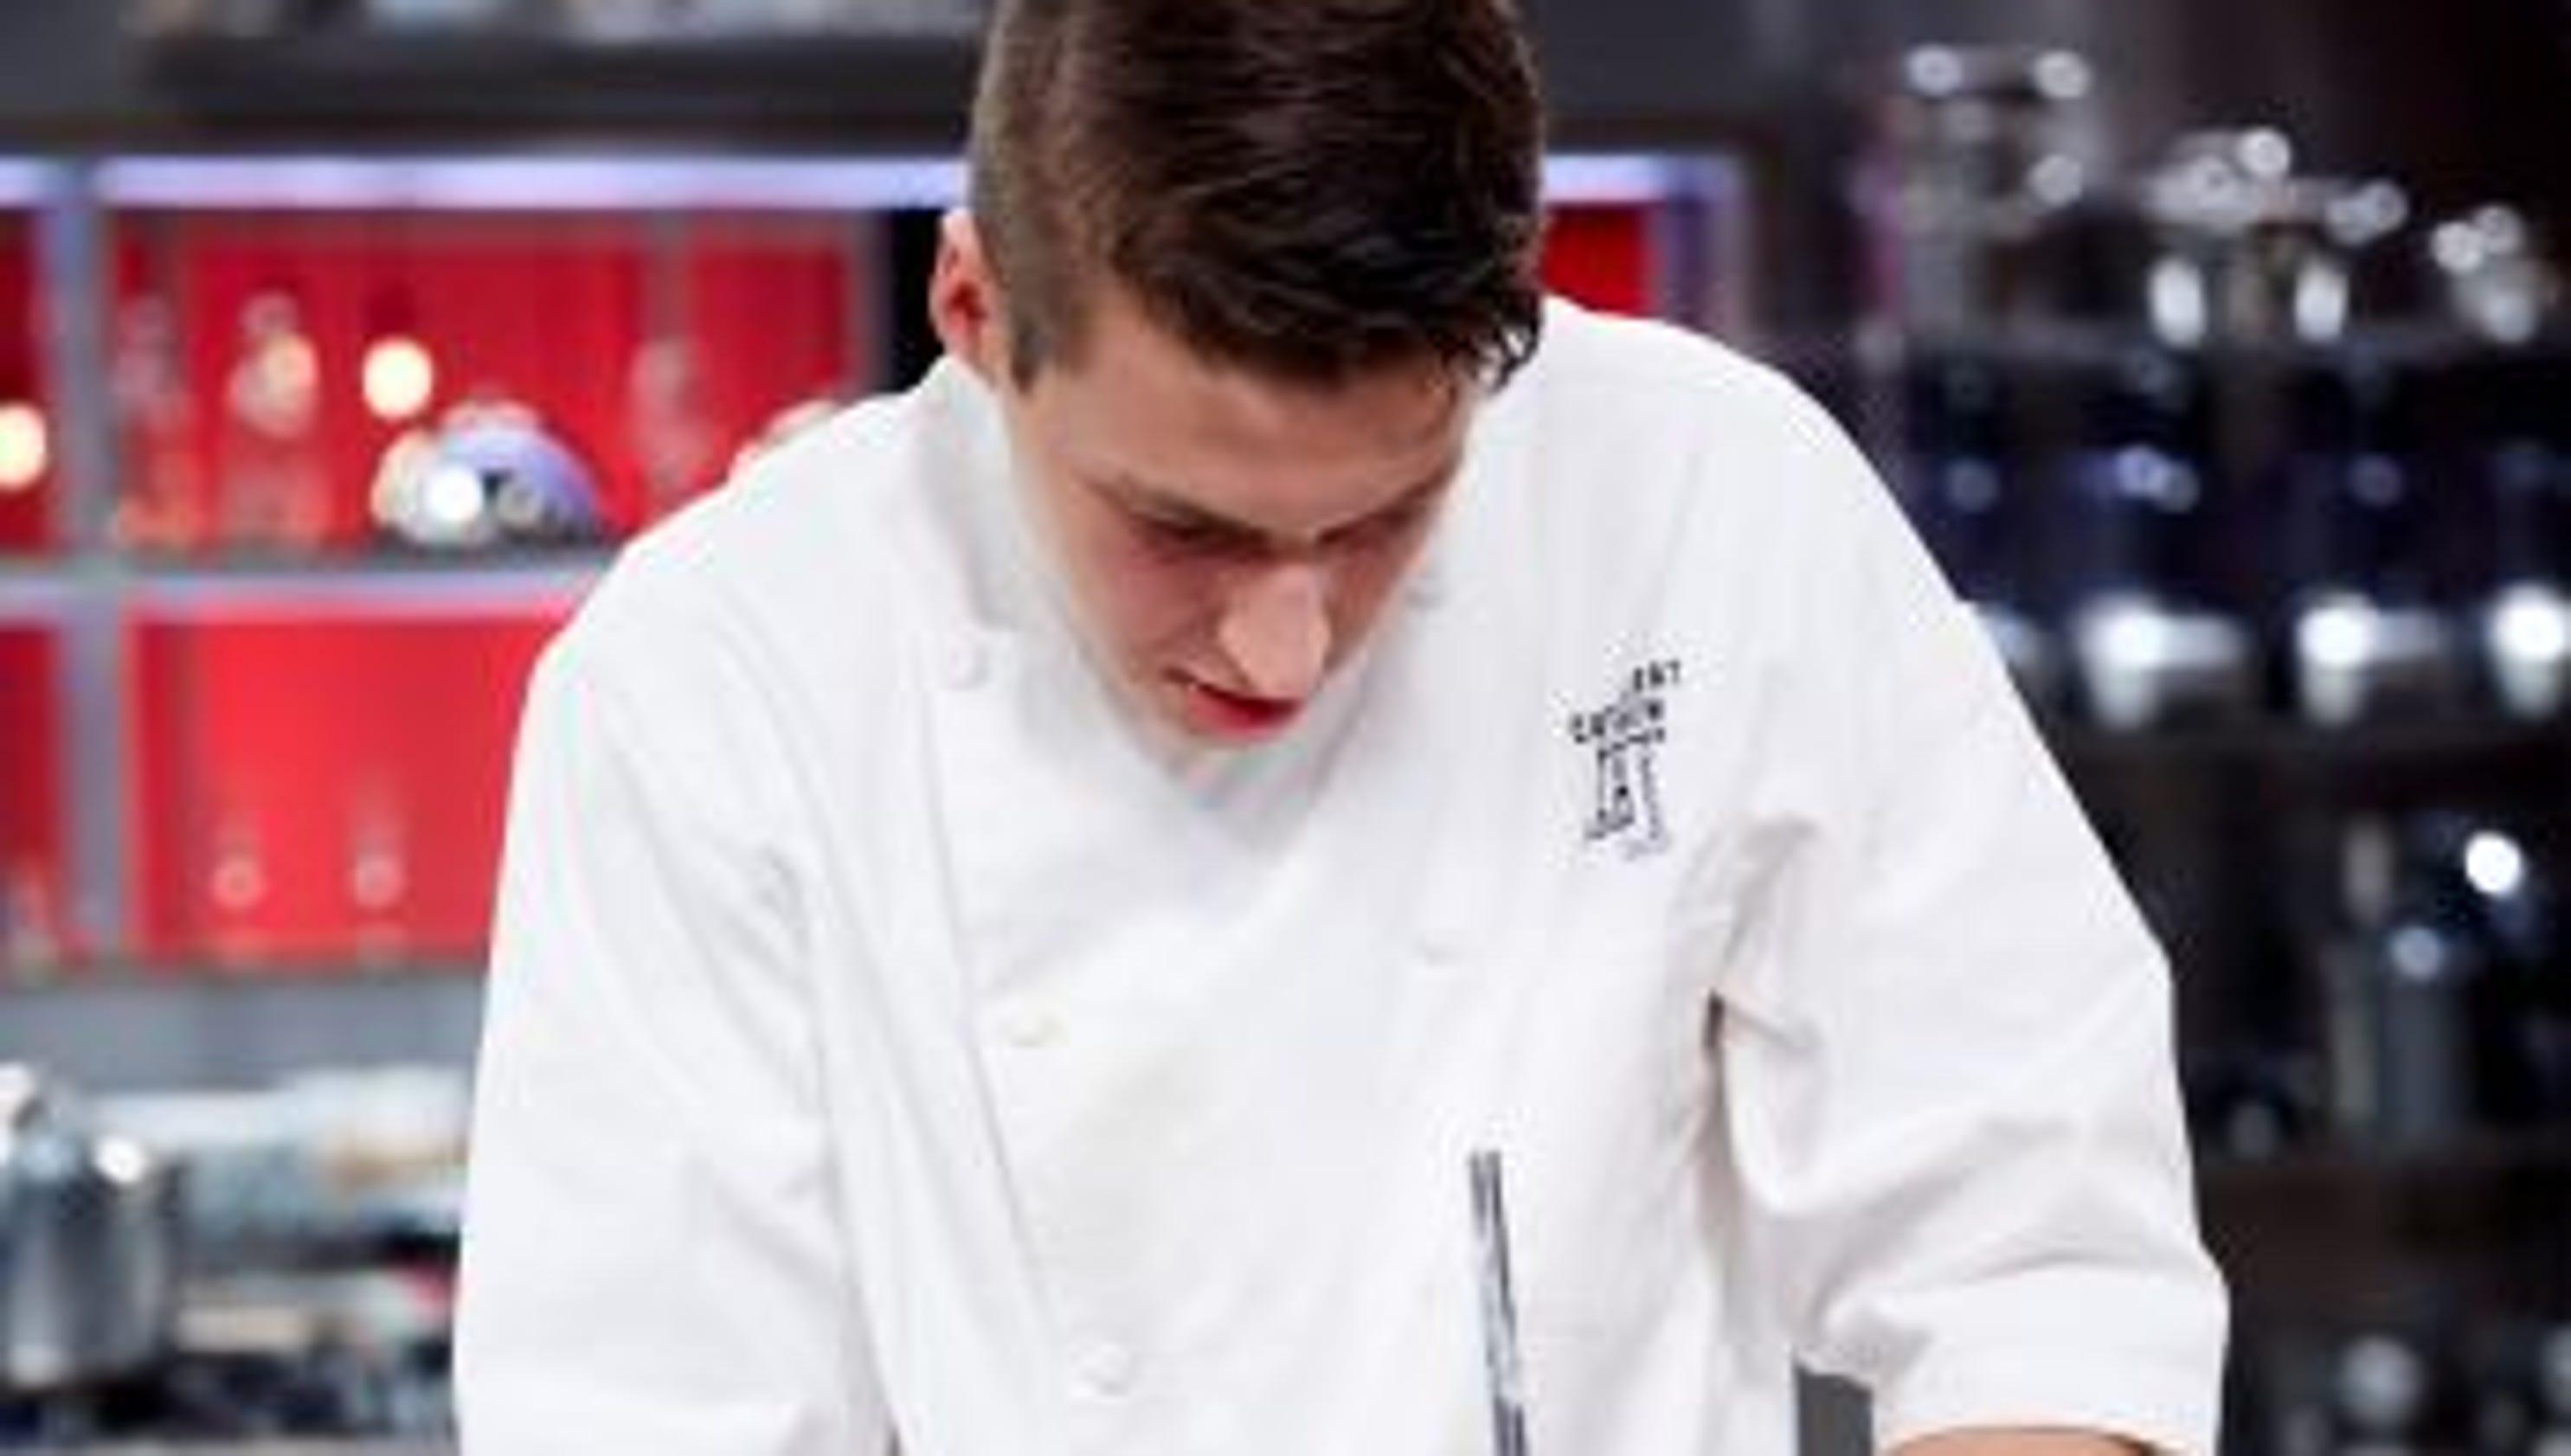 Scottsdale chef wins \'Cutthroat Kitchen,\' heads to finale